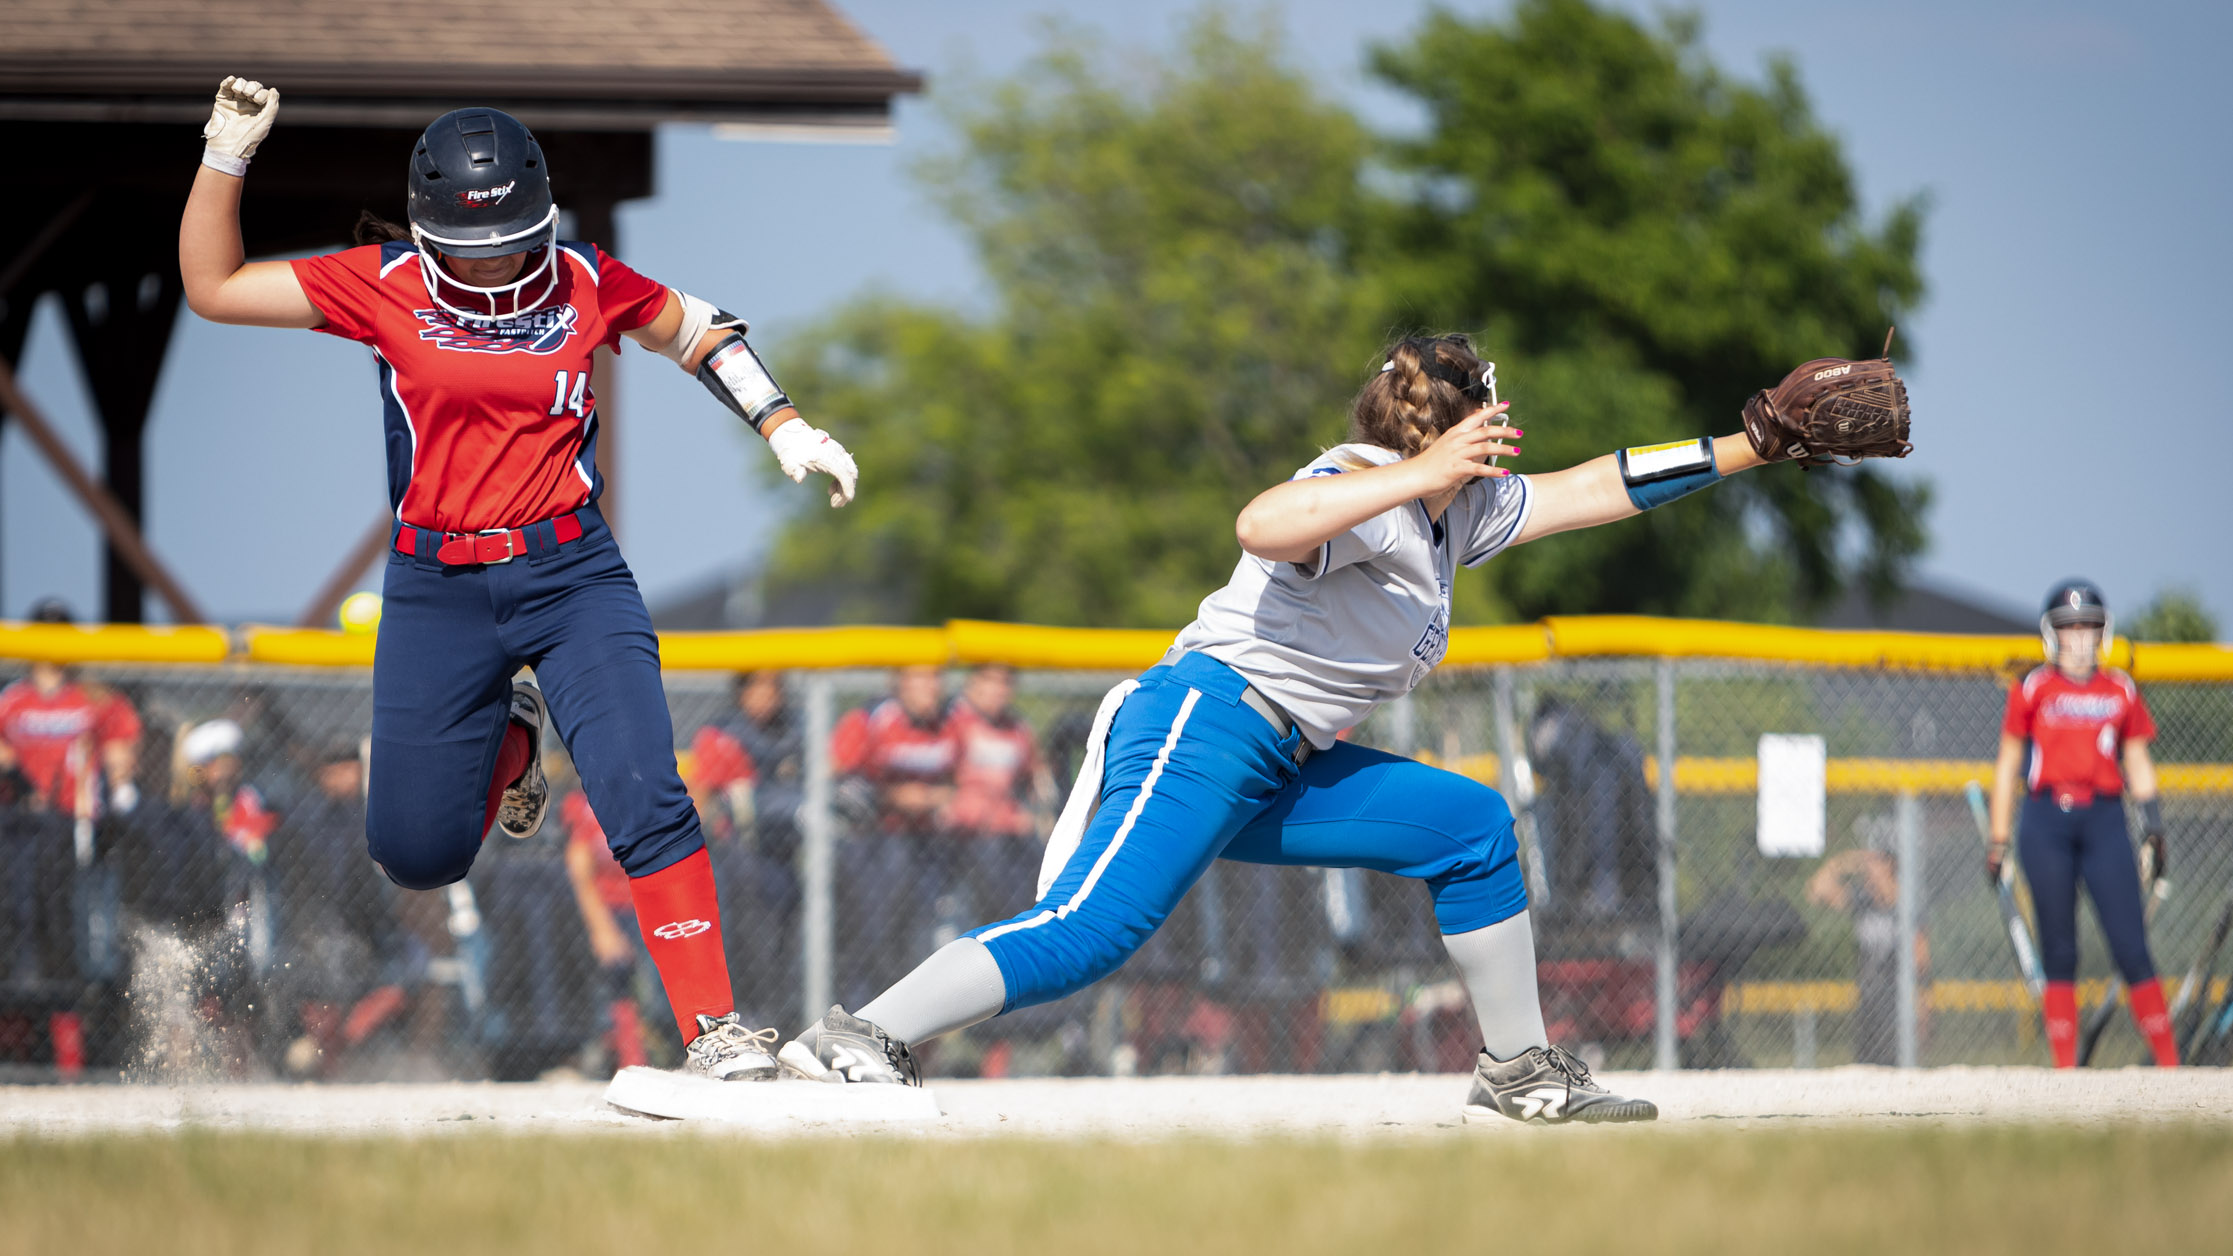 Firestix College Exposure Softball Tournament, Genesee County, MI